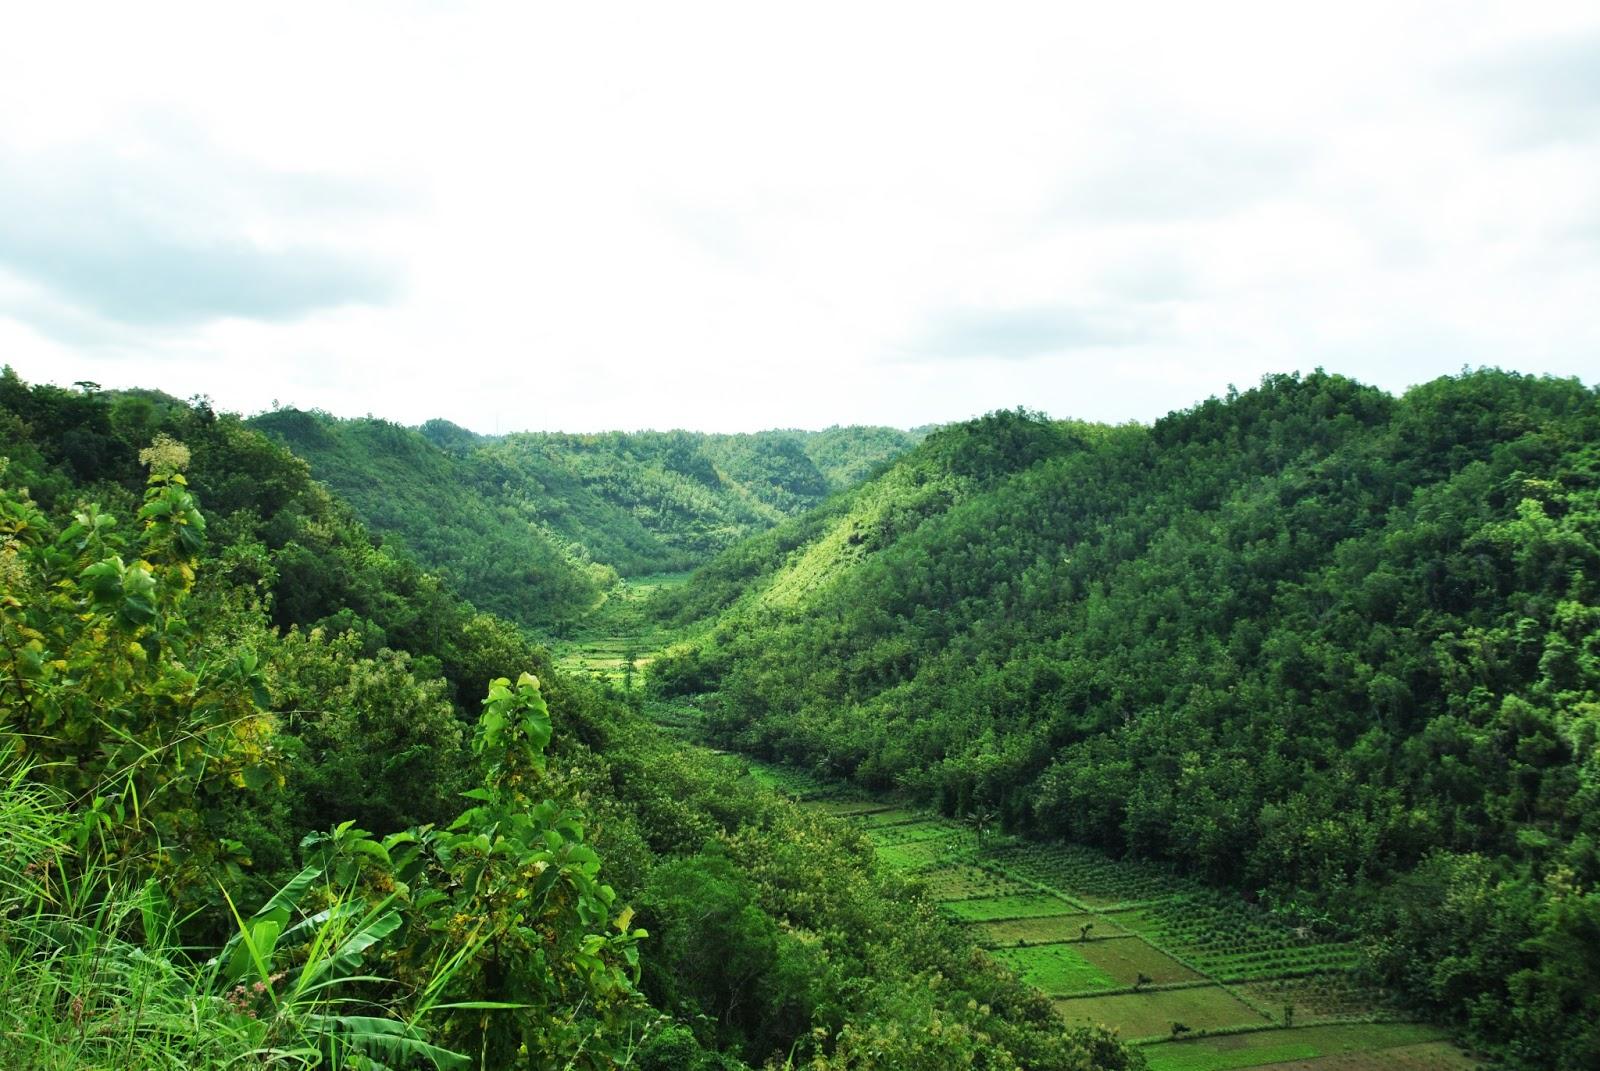 Wisata di Gunungkidul | khoiru blogspot